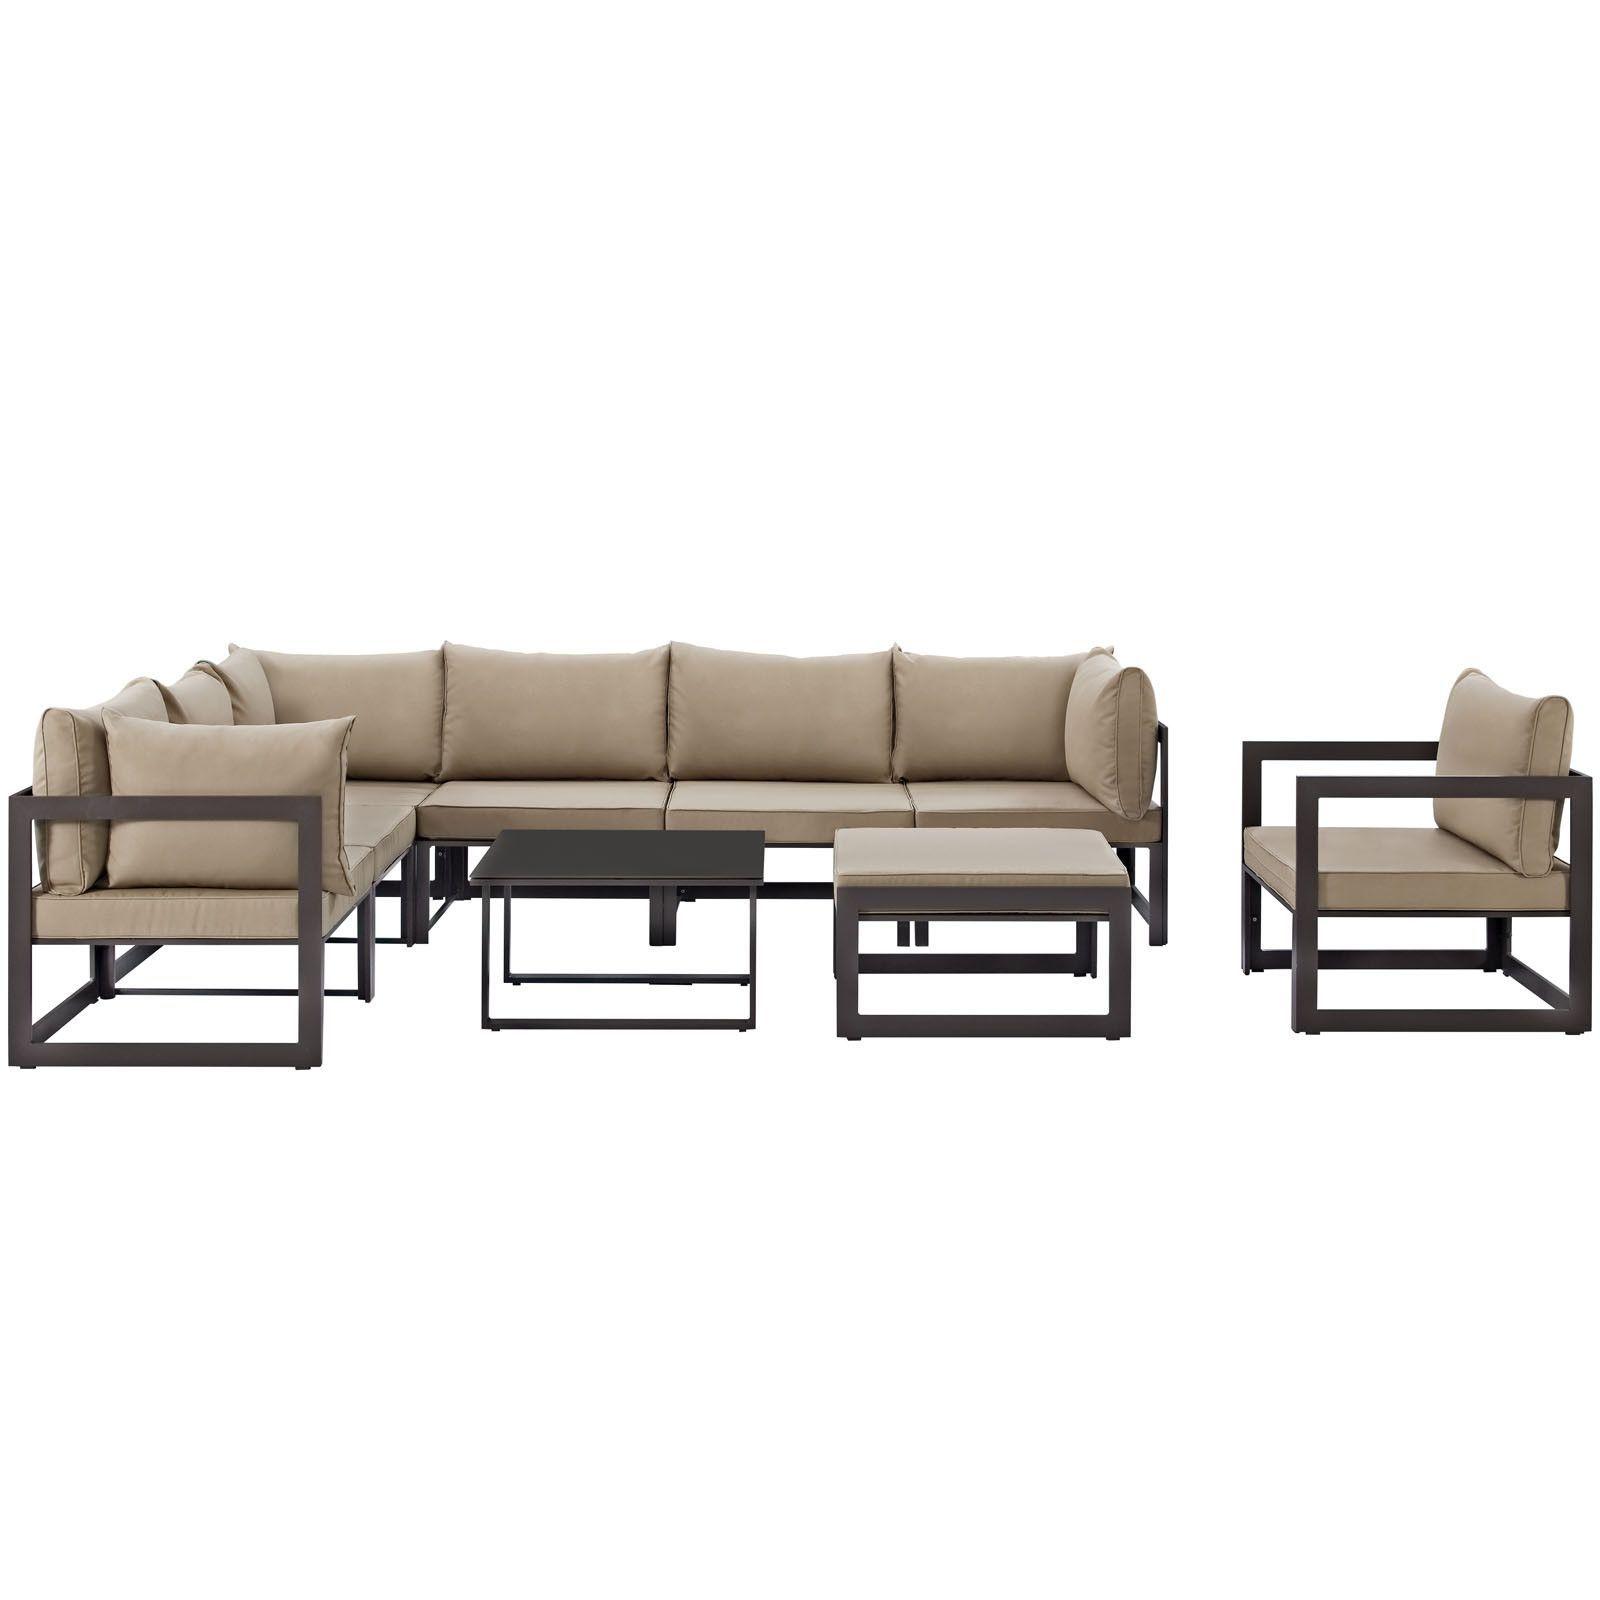 Fortuna 9 Piece Outdoor Patio Sectional Sofa Set